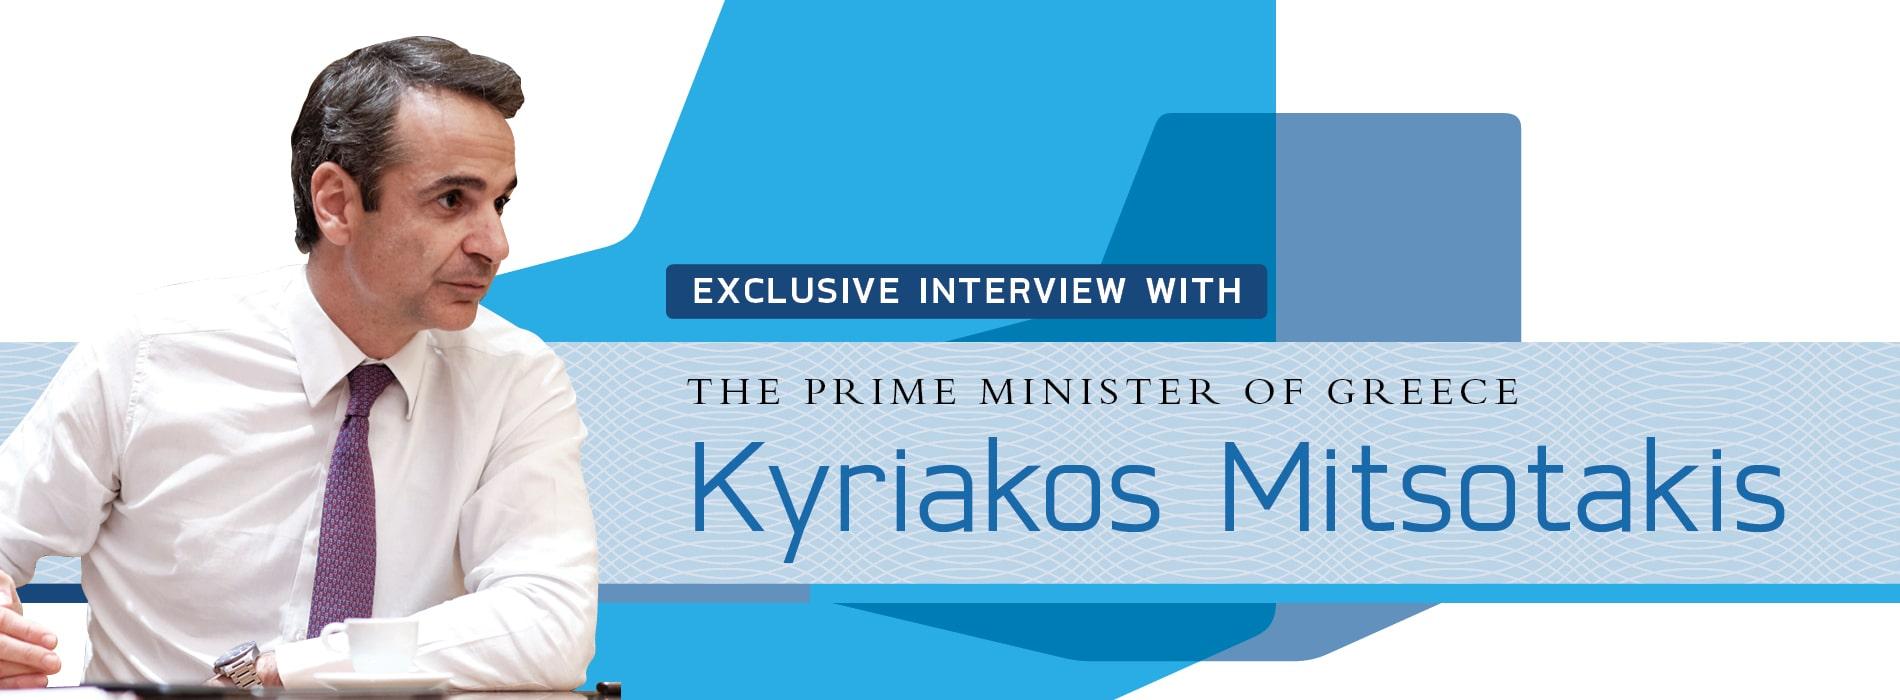 Interview with Kyriakos Mitsotakis,Prime Minister of Greece